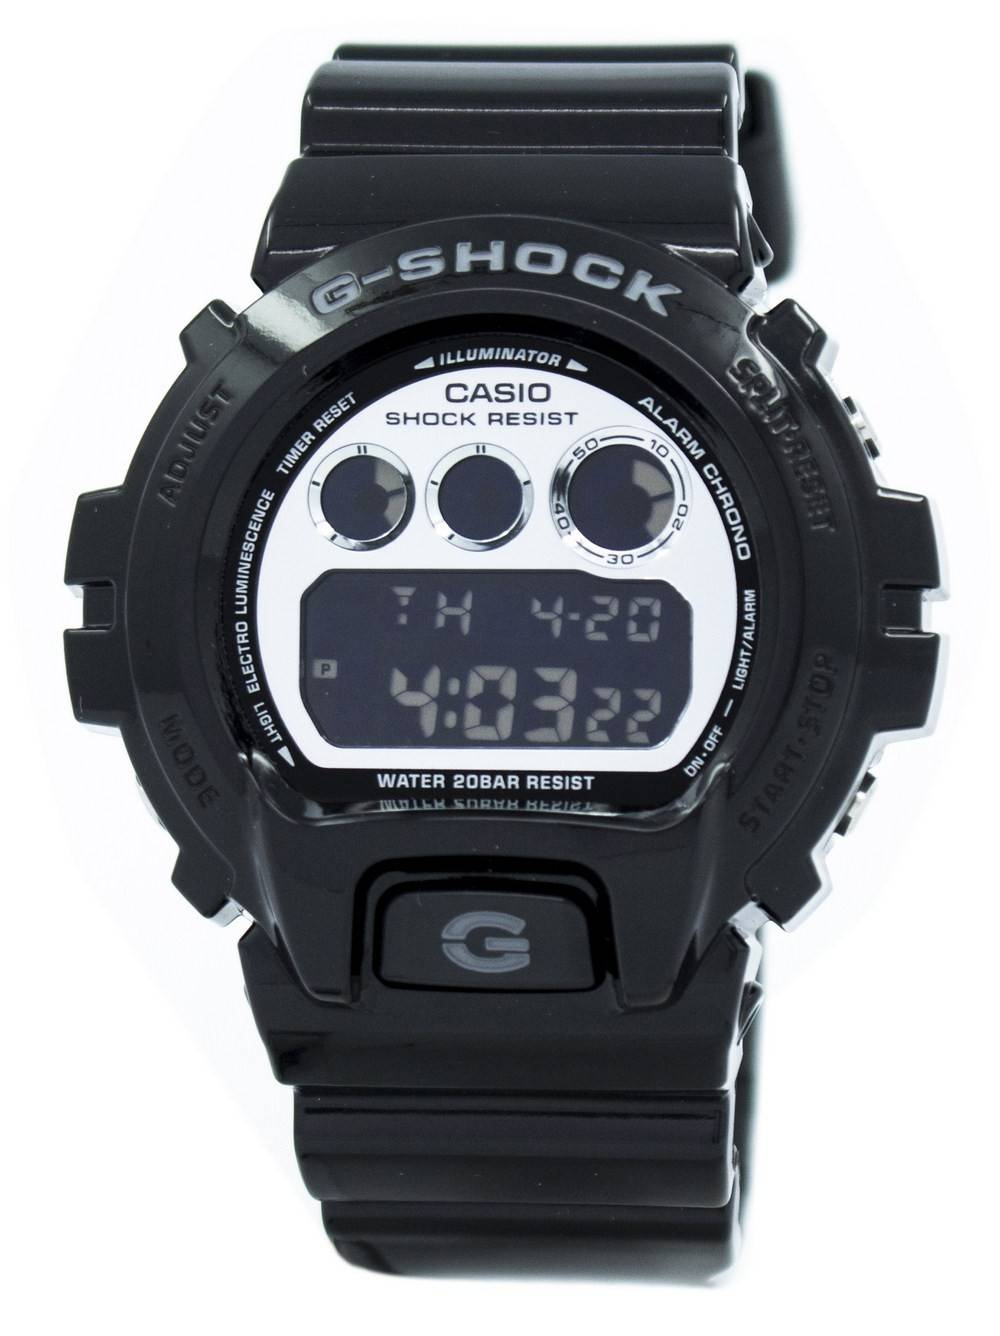 Detalles de Reloj para hombre Casio G Shock DW 6900NB 1DR DW 6900NB 1 DW6900NB 1